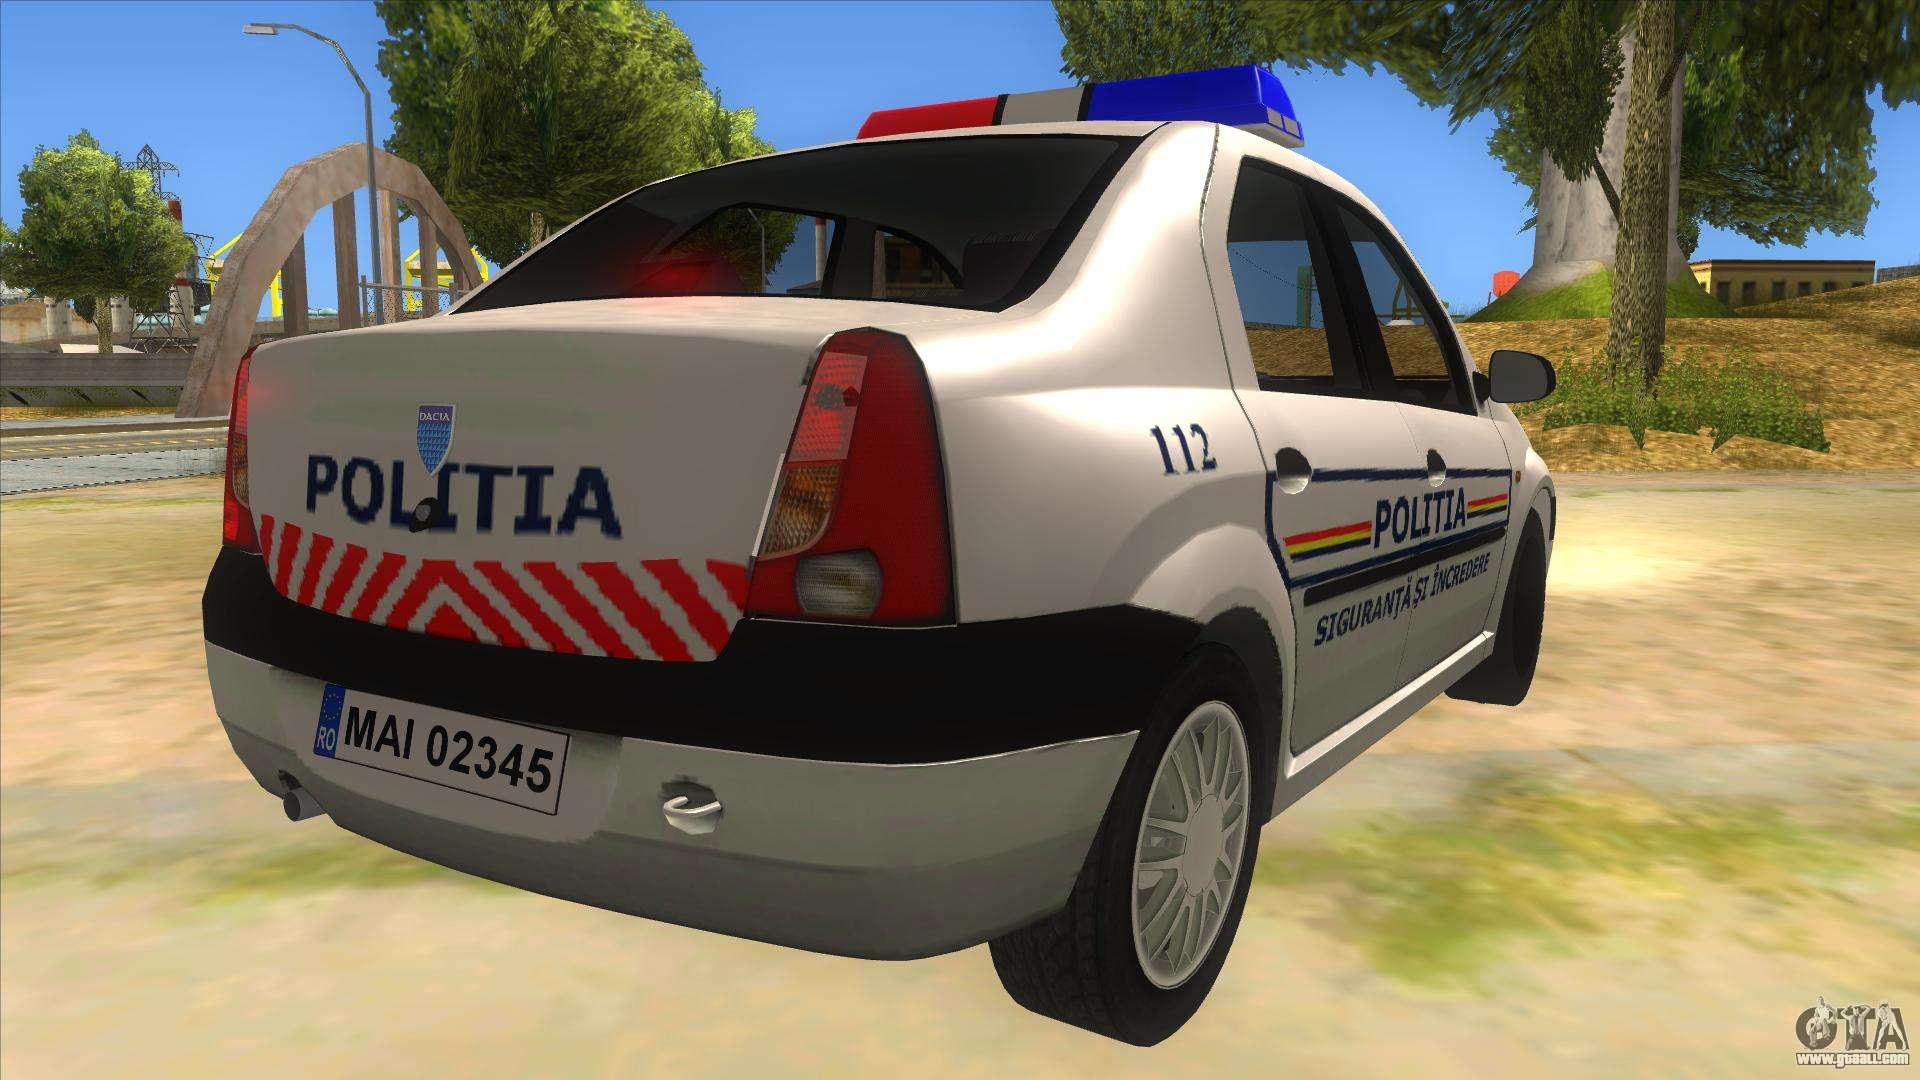 Dacia logan romanian 50 plus milf